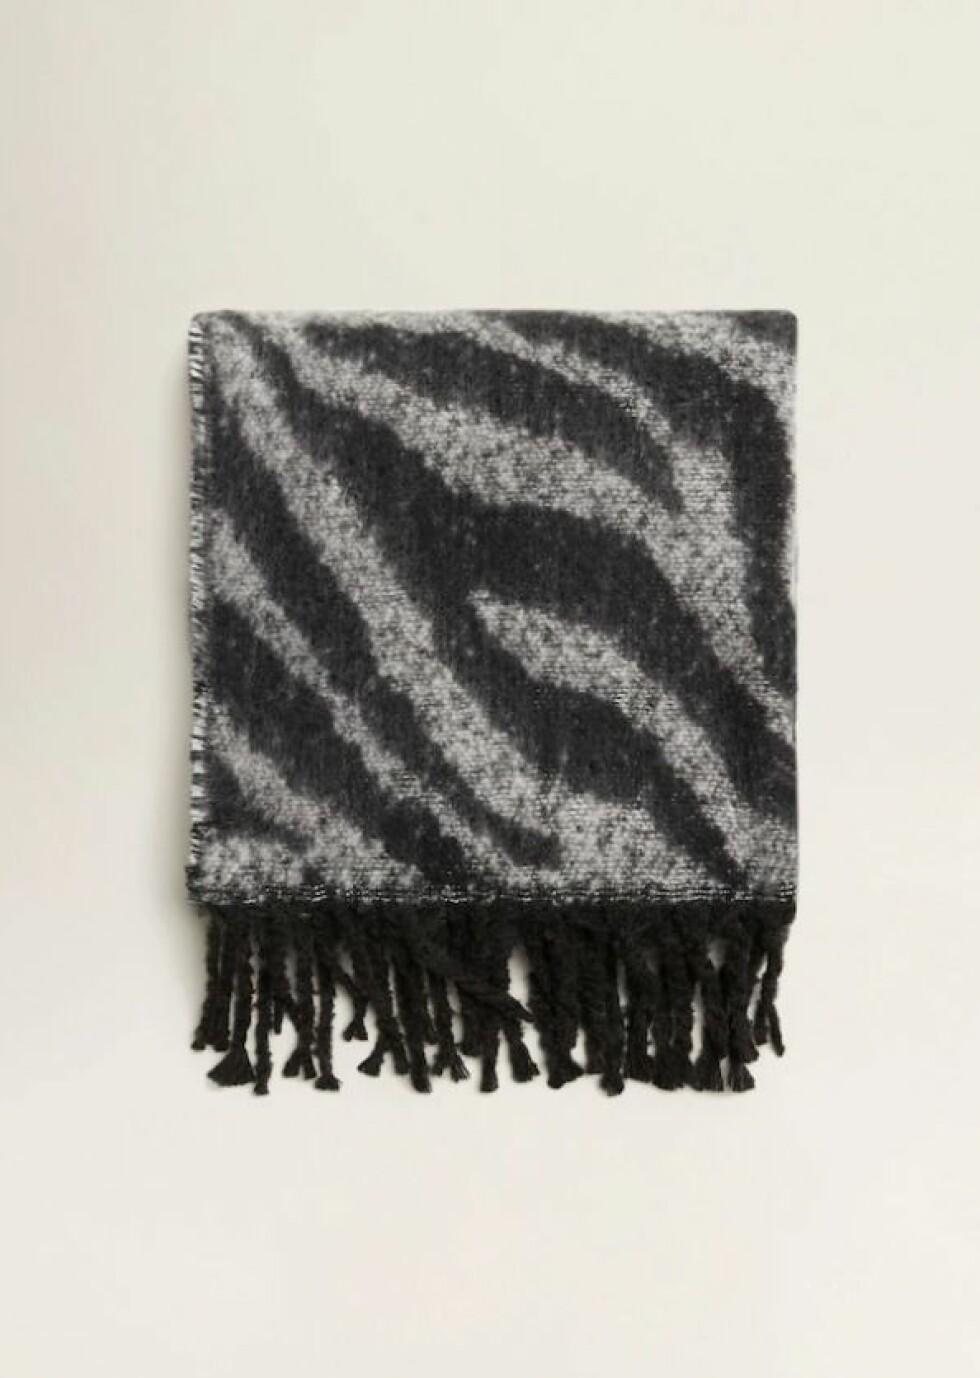 Skjerf fra Mango  299,-  https://shop.mango.com/no-en/women/scarves-and-foulards/zebra-printed-scarf_33045780.html?c=99&n=1&s=accesorios_she.accesorio;52,452